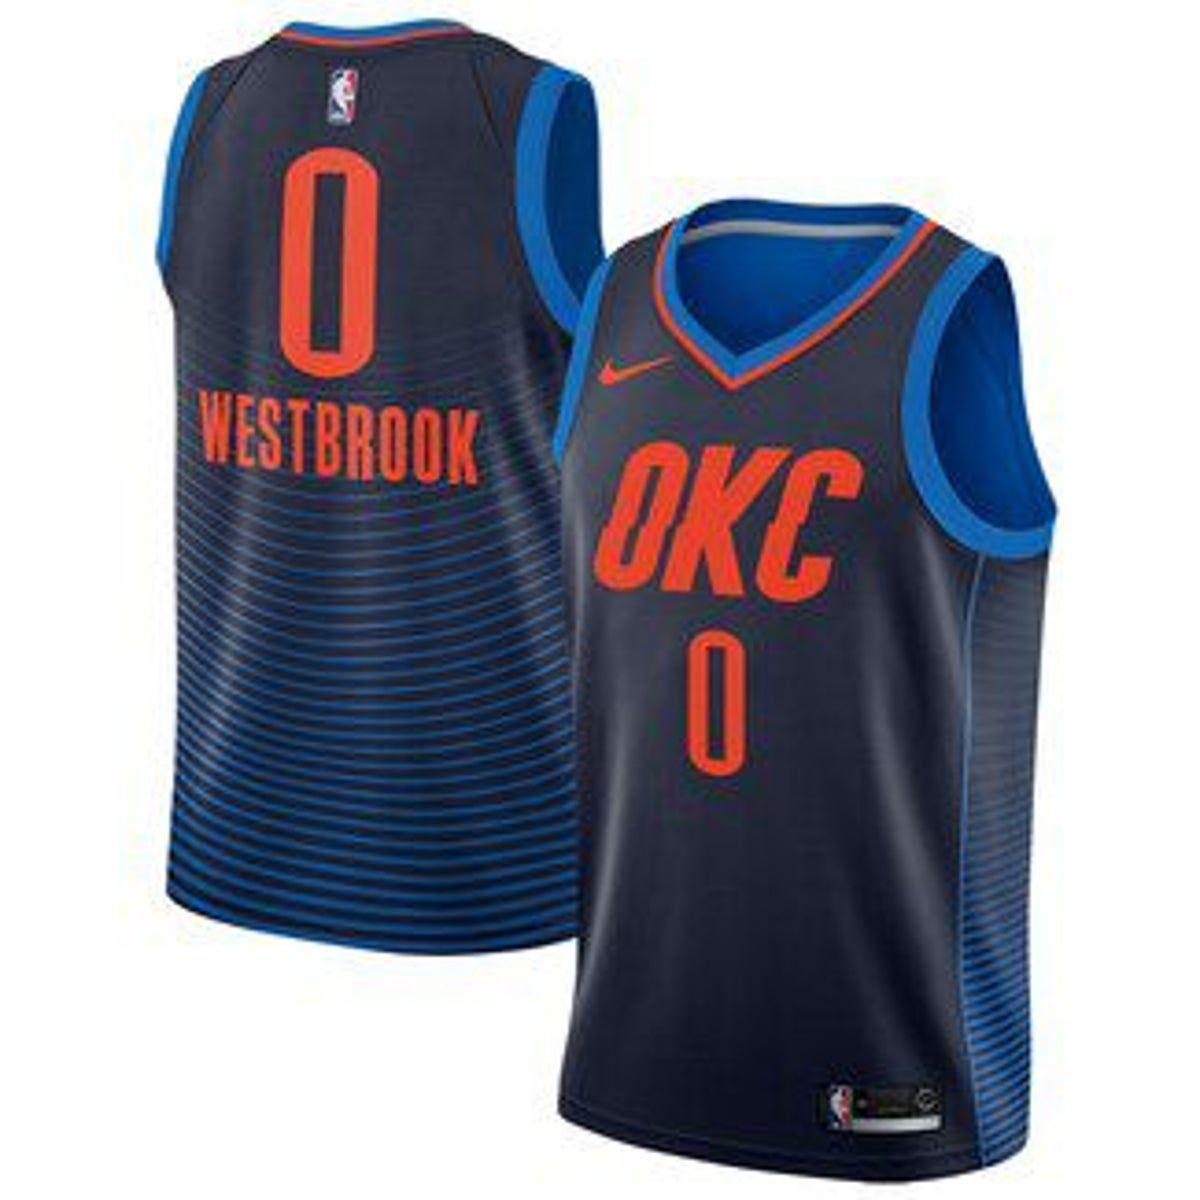 Pin By Jeremy On Denilson In 2020 Basketball Uniforms Design Nba Jersey Oklahoma City Thunder